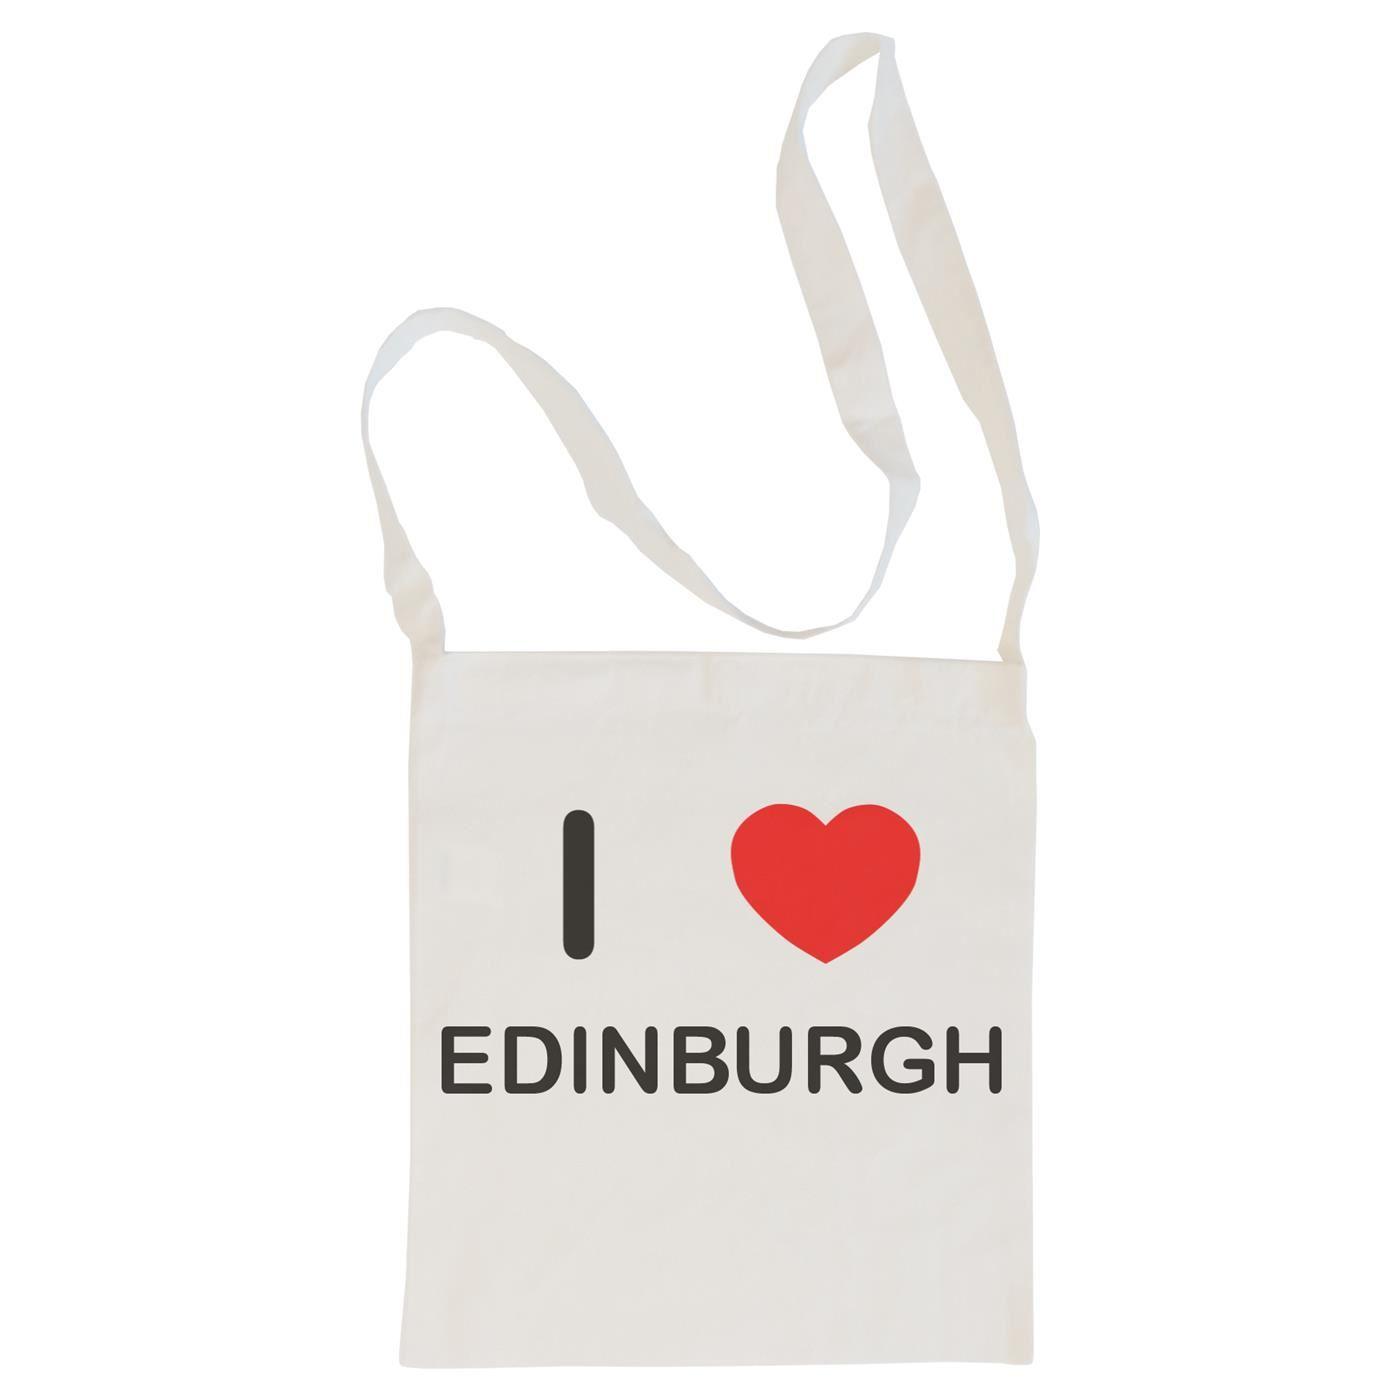 I Love Edinburgh - Cotton Bag | Size choice Tote, Shopper or Sling